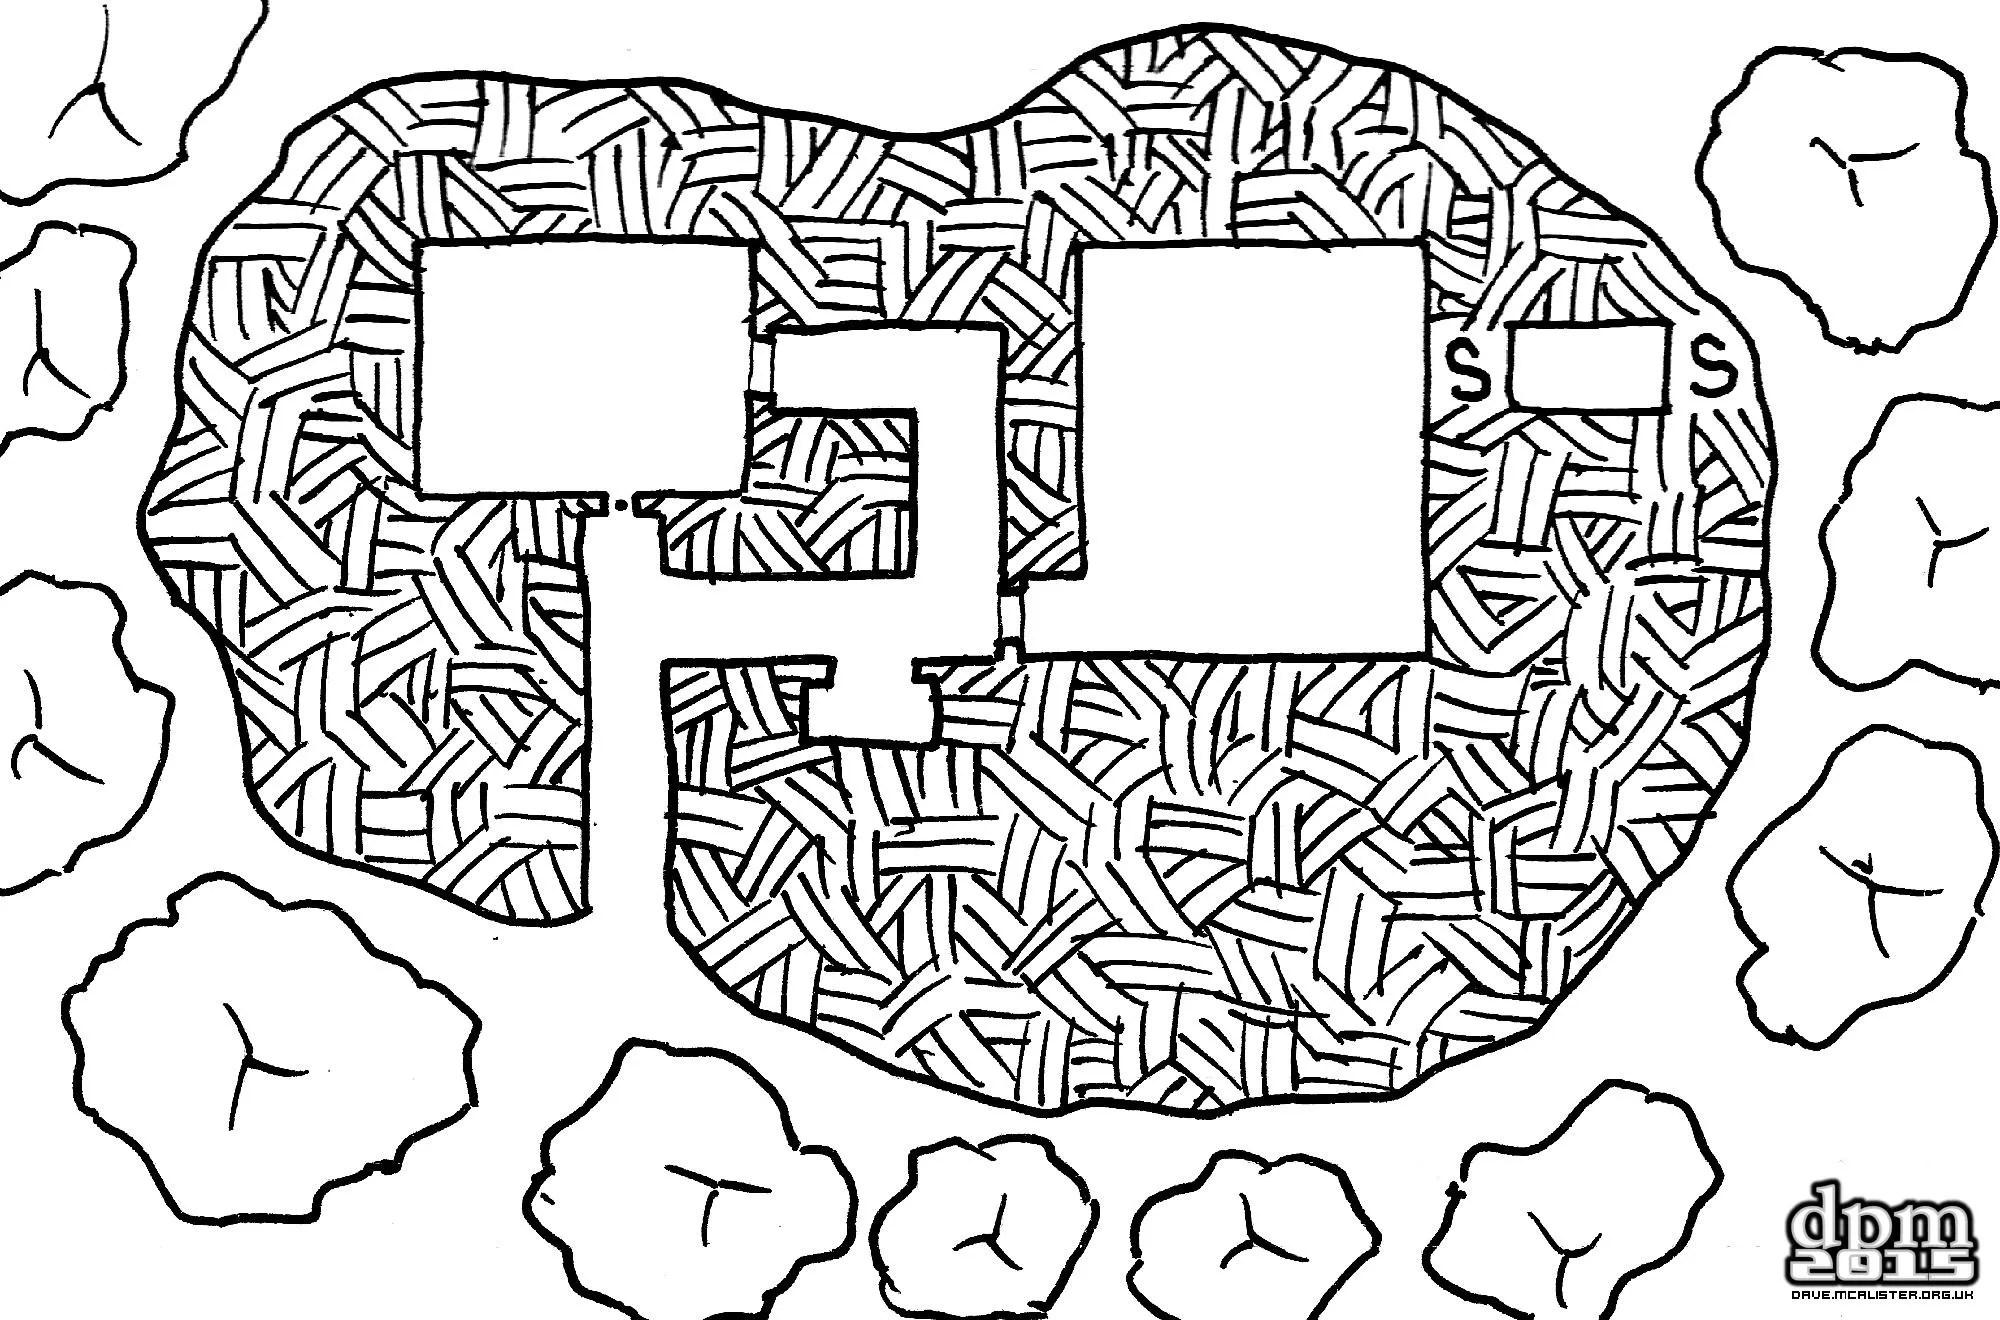 [Friday Map] Burial Barrow